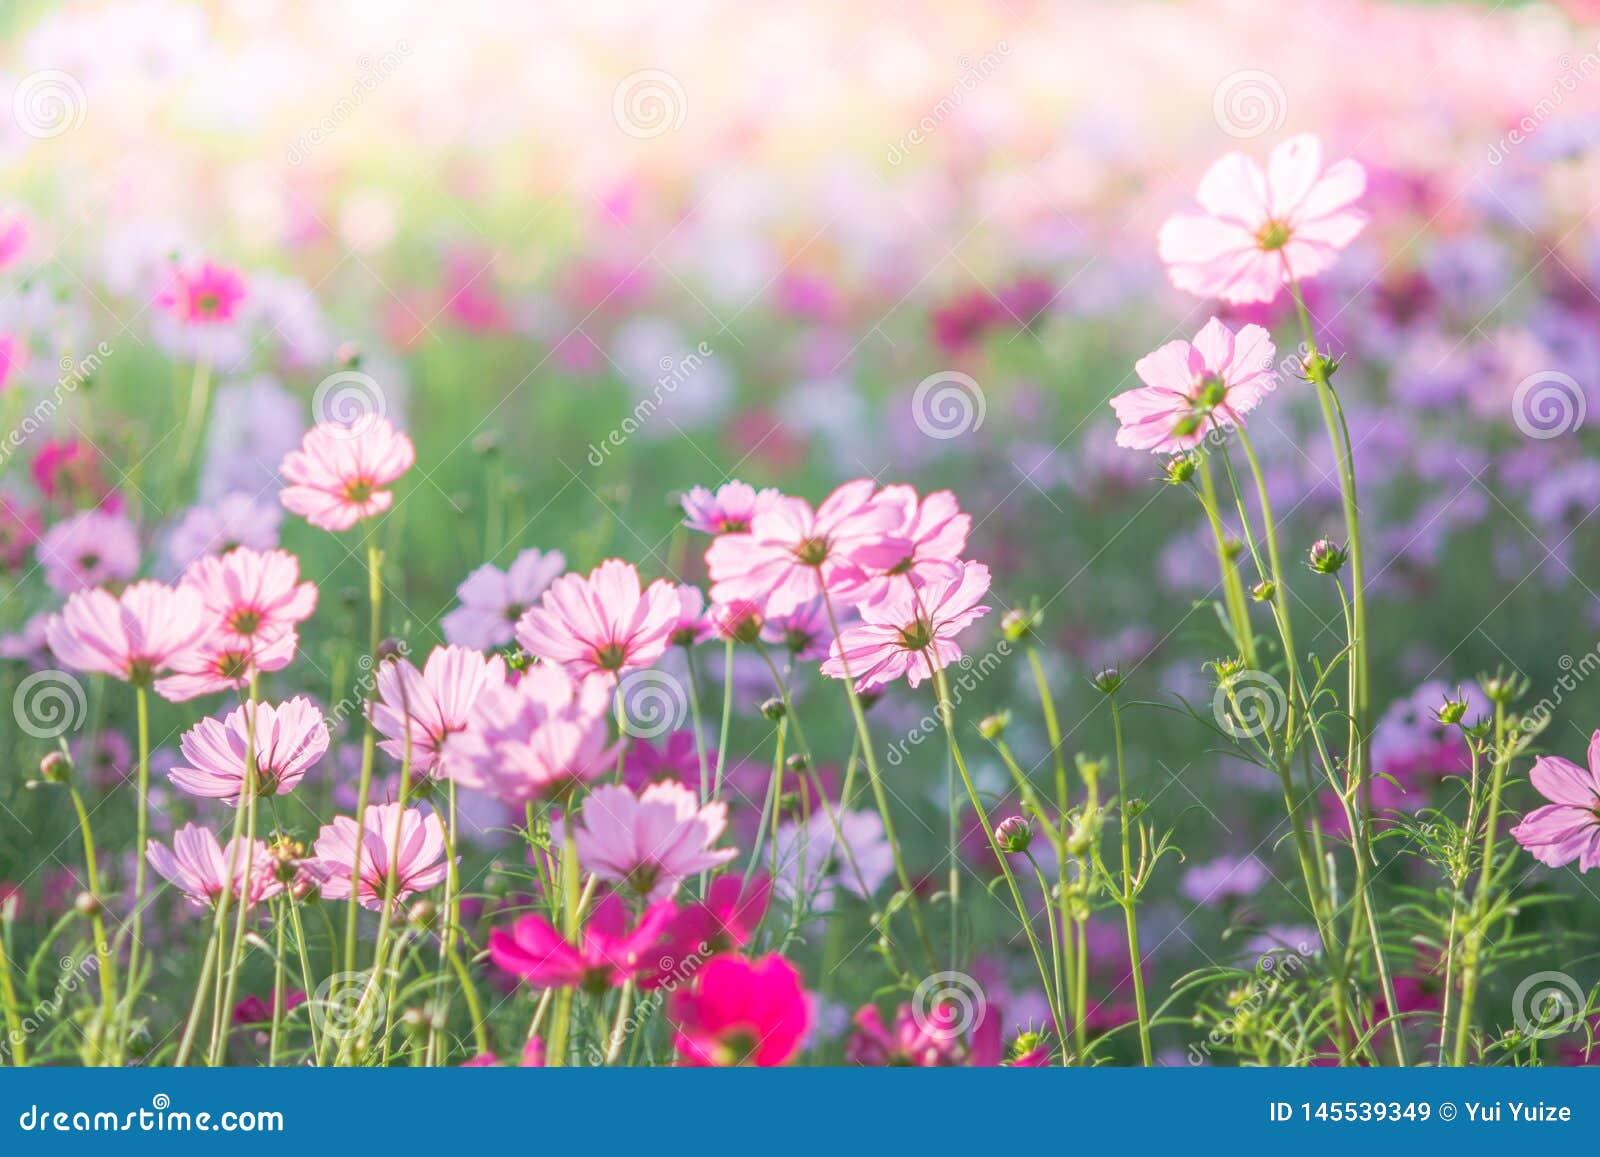 Pink Cosmos flowers field, landscape of flowers.